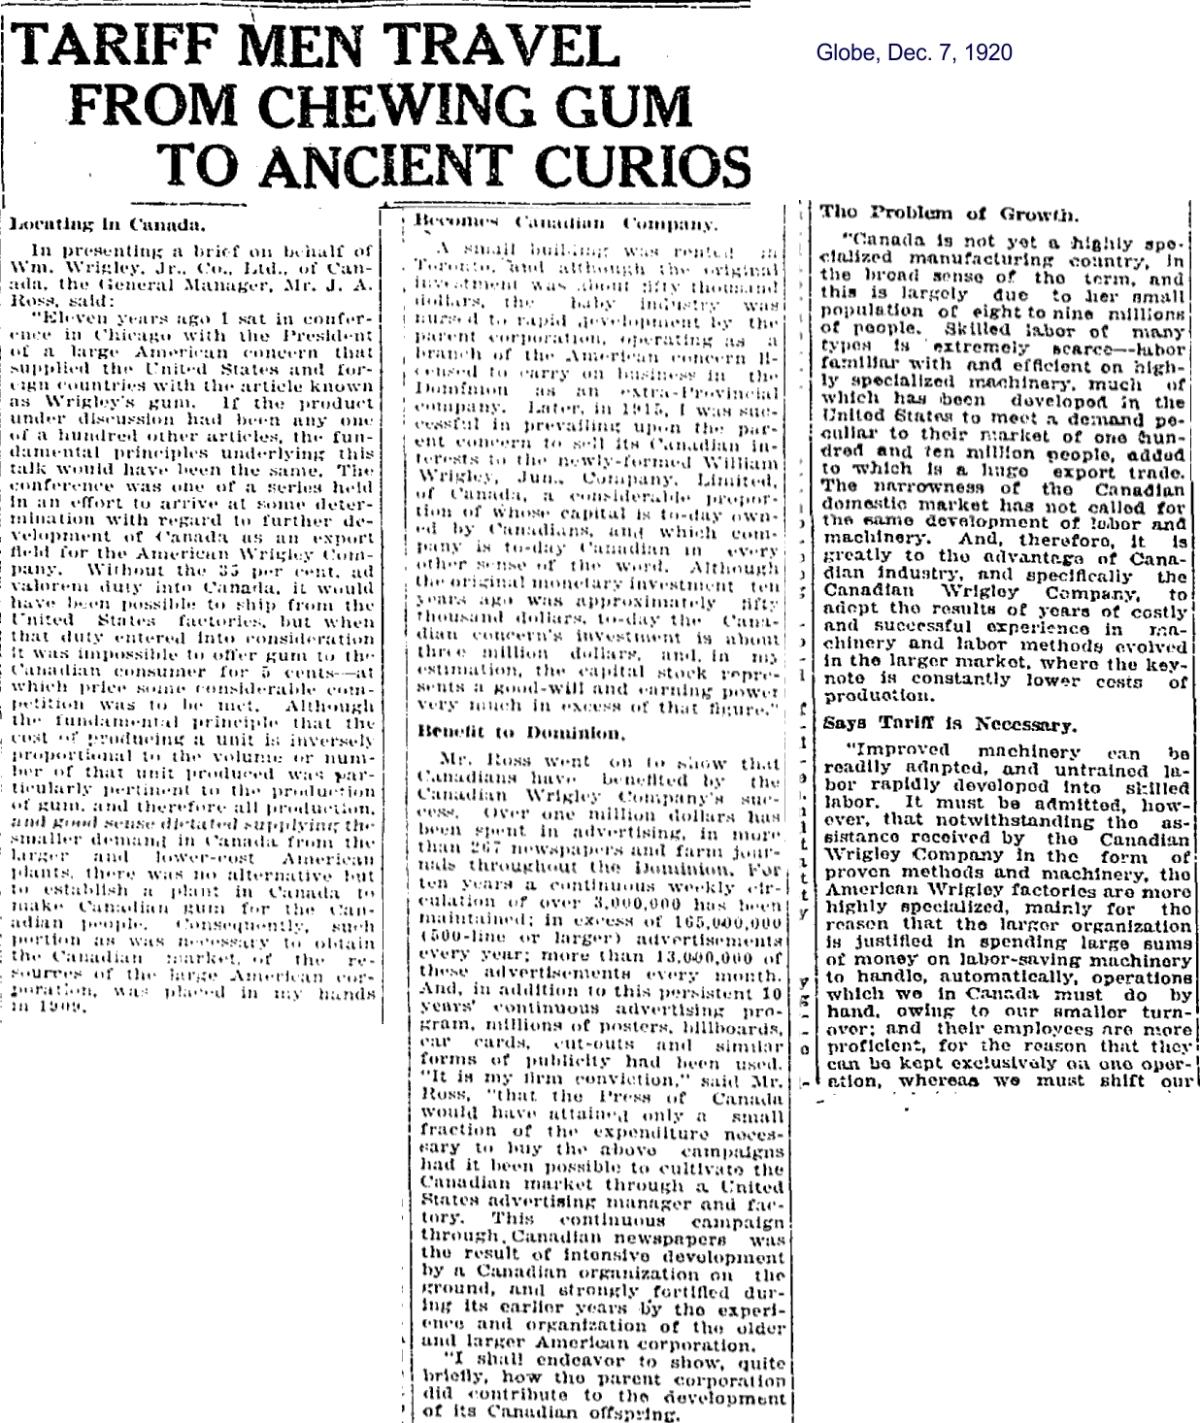 globe-dec-7-1920-column-1